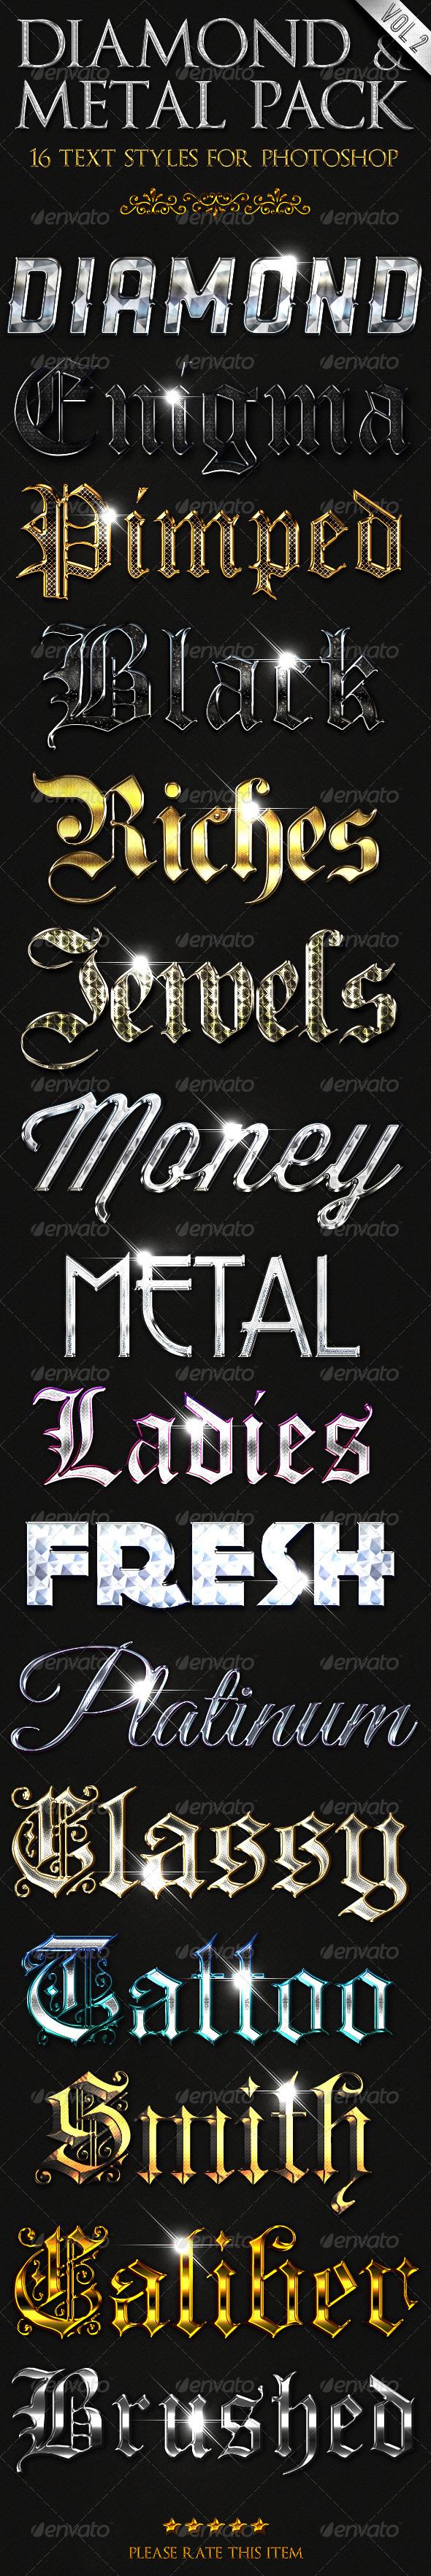 GraphicRiver Diamond & Metal vol 2 Text Styles 2819292